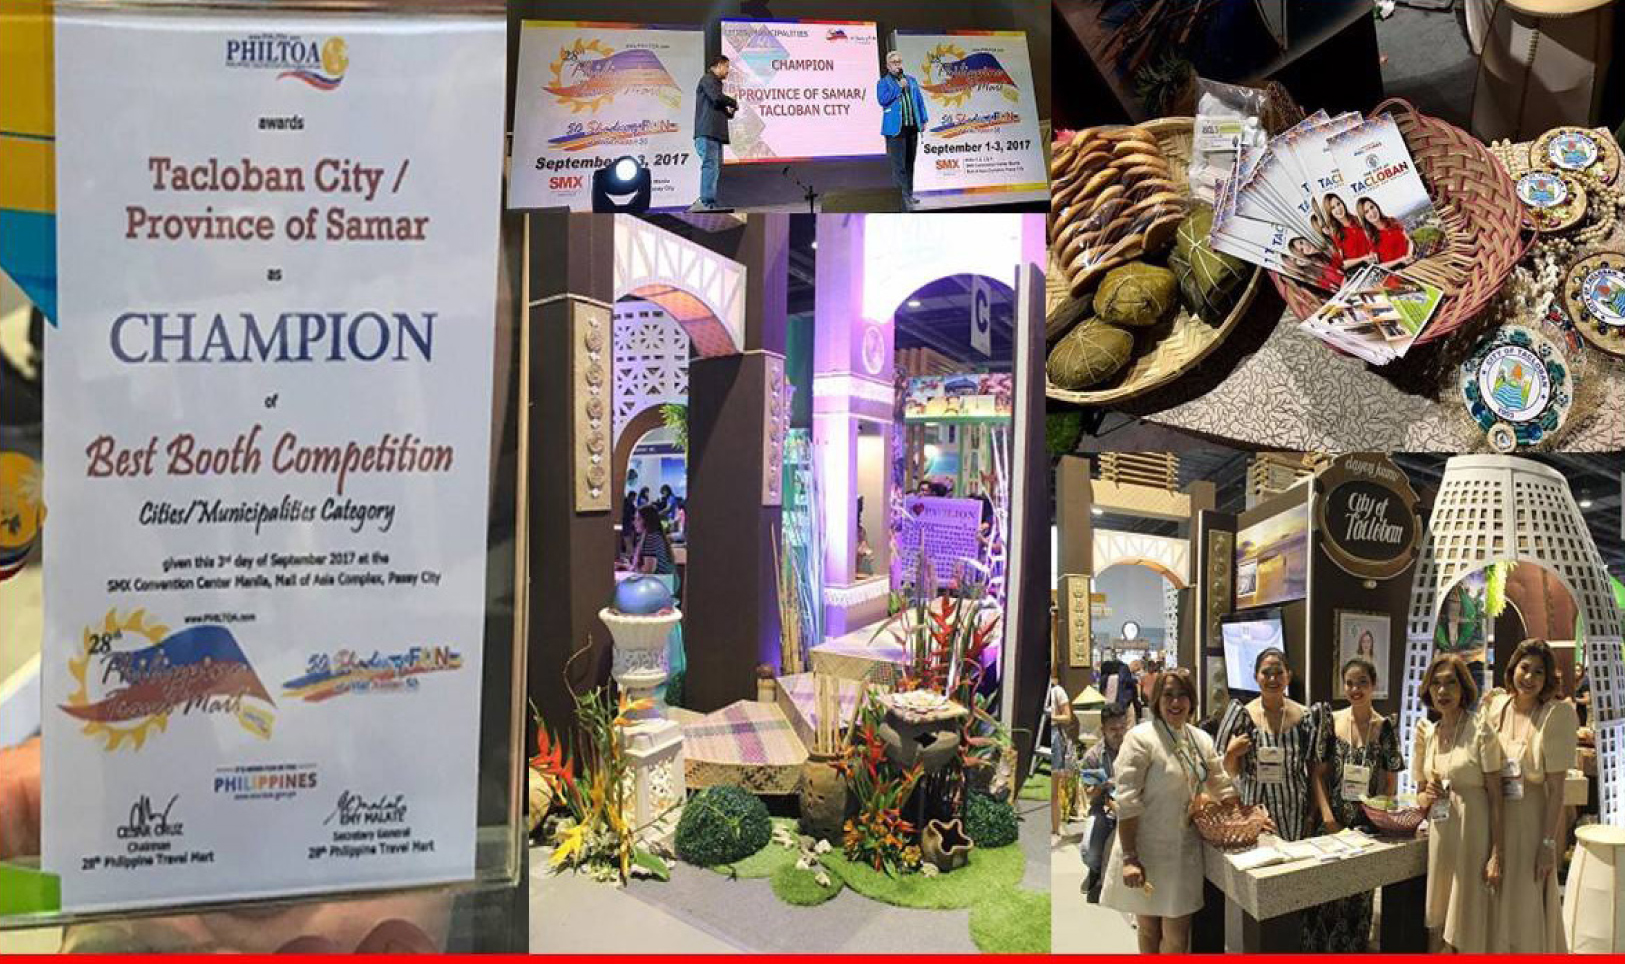 Mayor Romualdez extends congratulations to tourism office